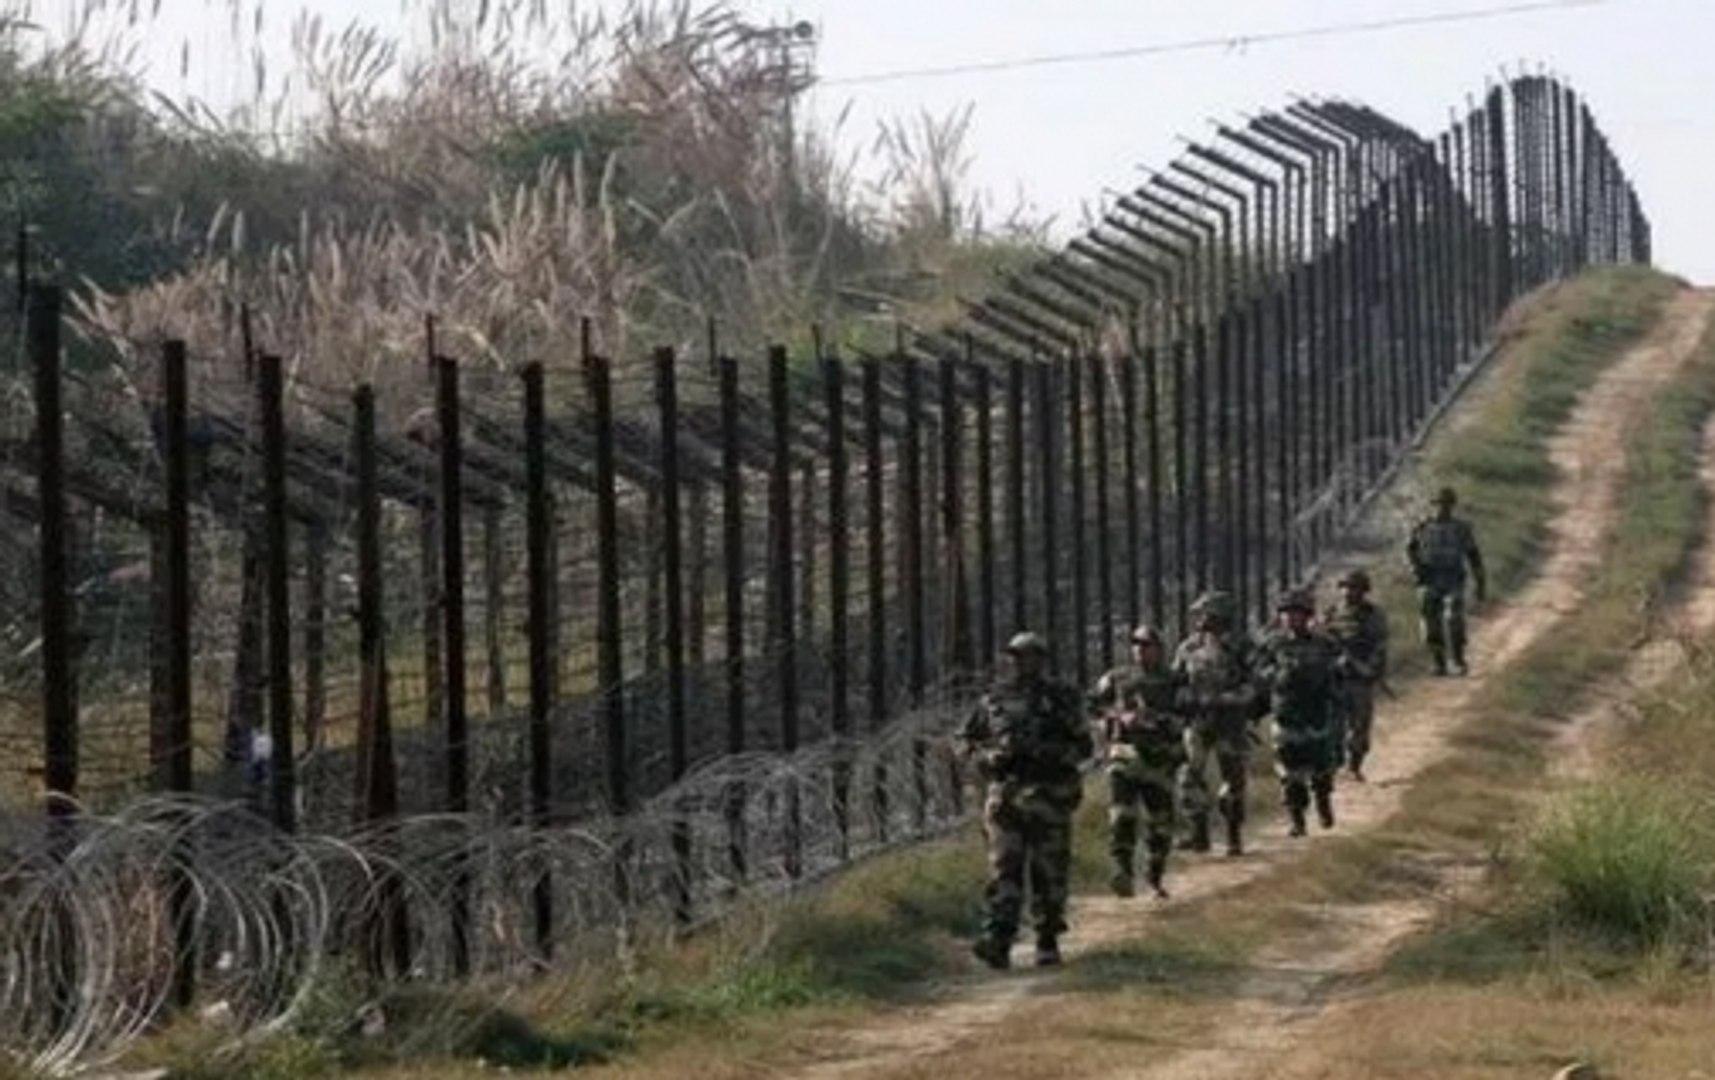 Pakistan violates ceasefire in Poonch, Nowshera area near LoC